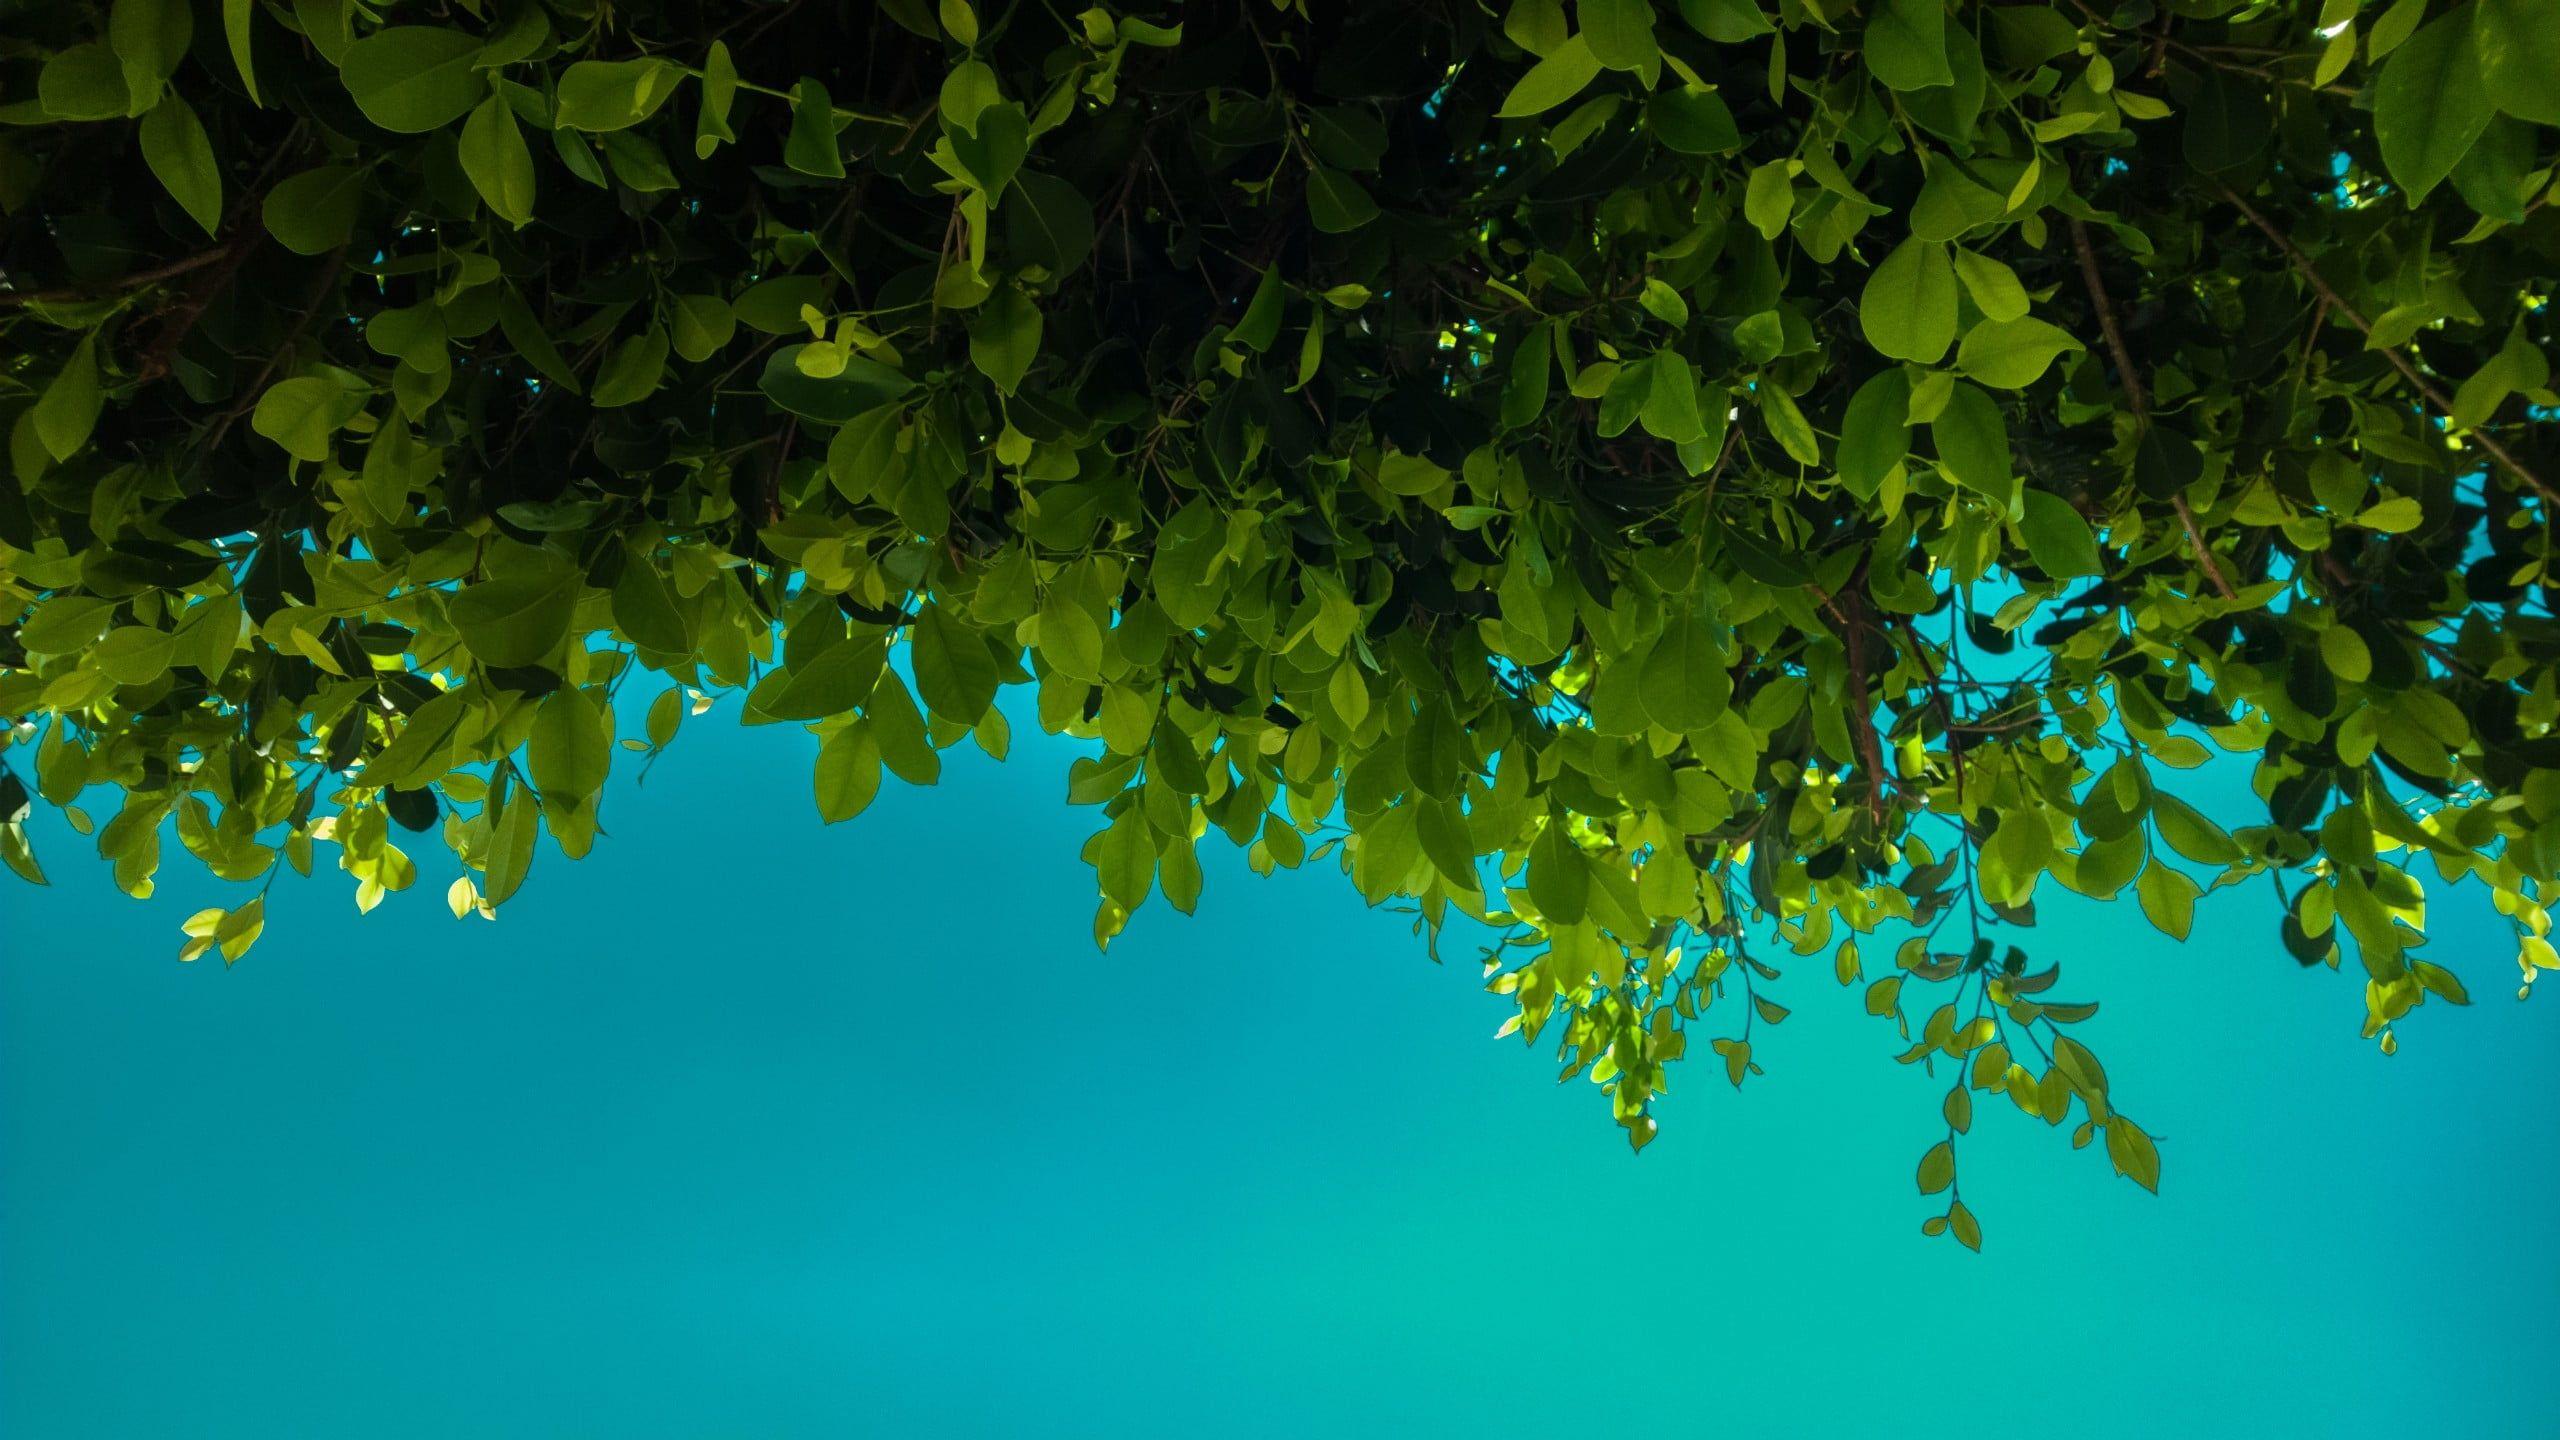 green leafed plants green leaves blue nature 2K